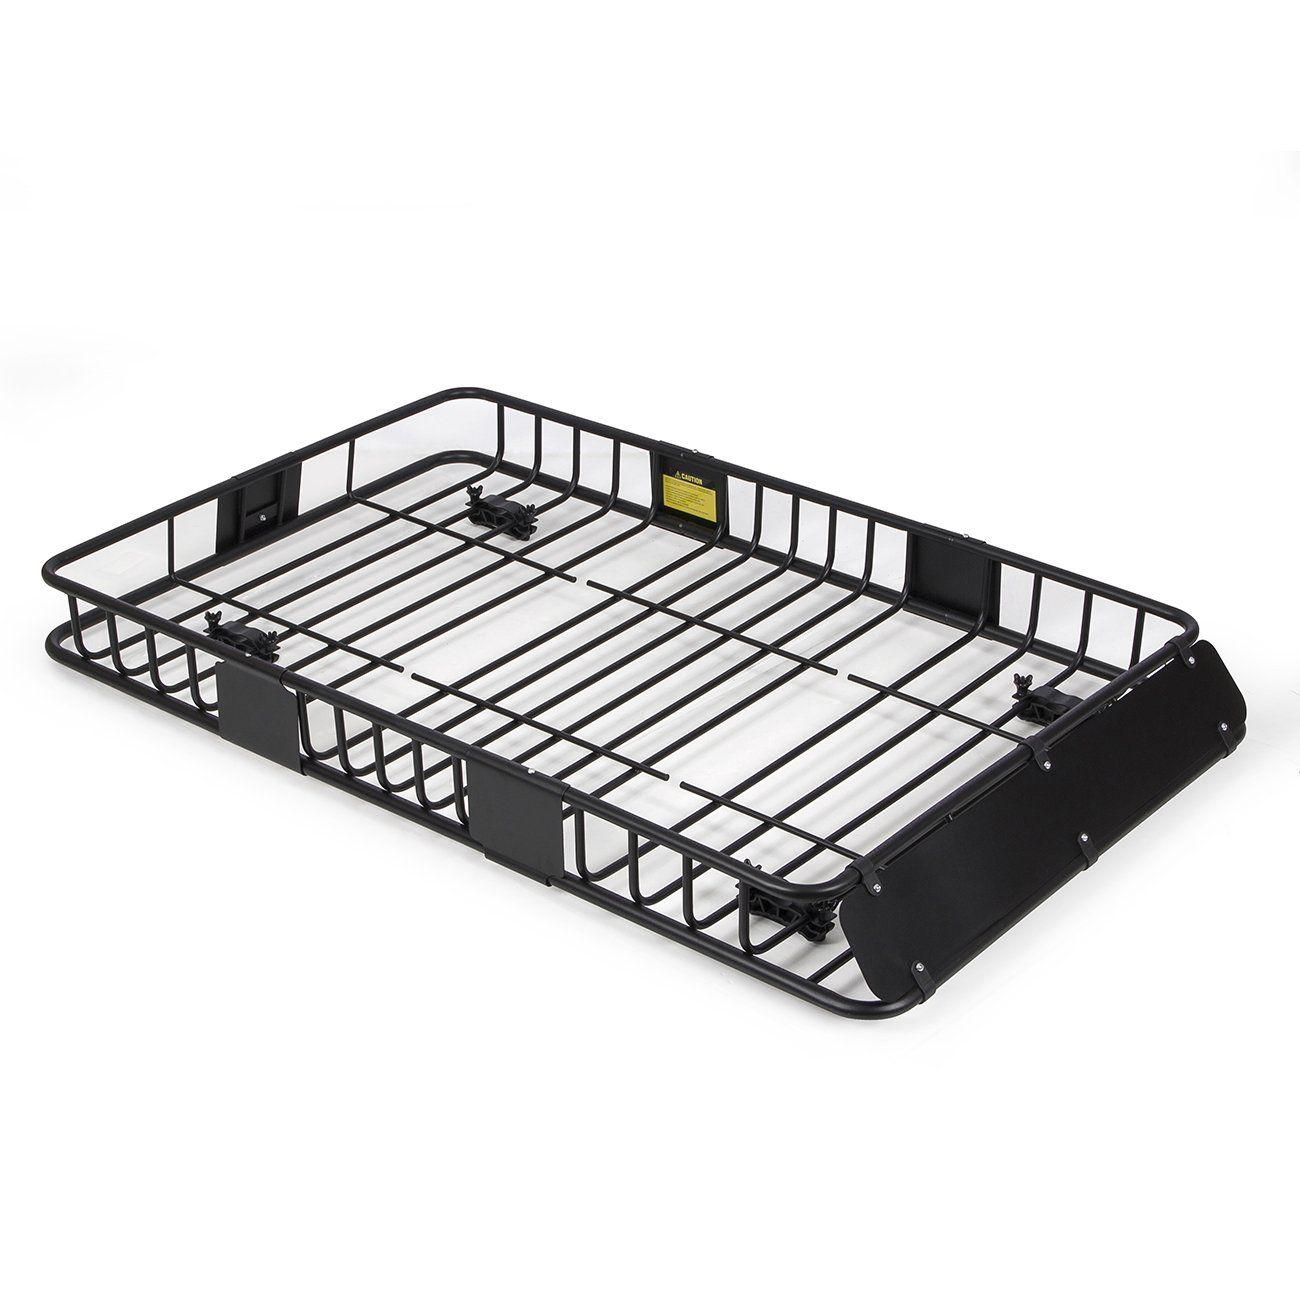 ARKSEN 64 Universal Black Roof Rack Cargo with Extension